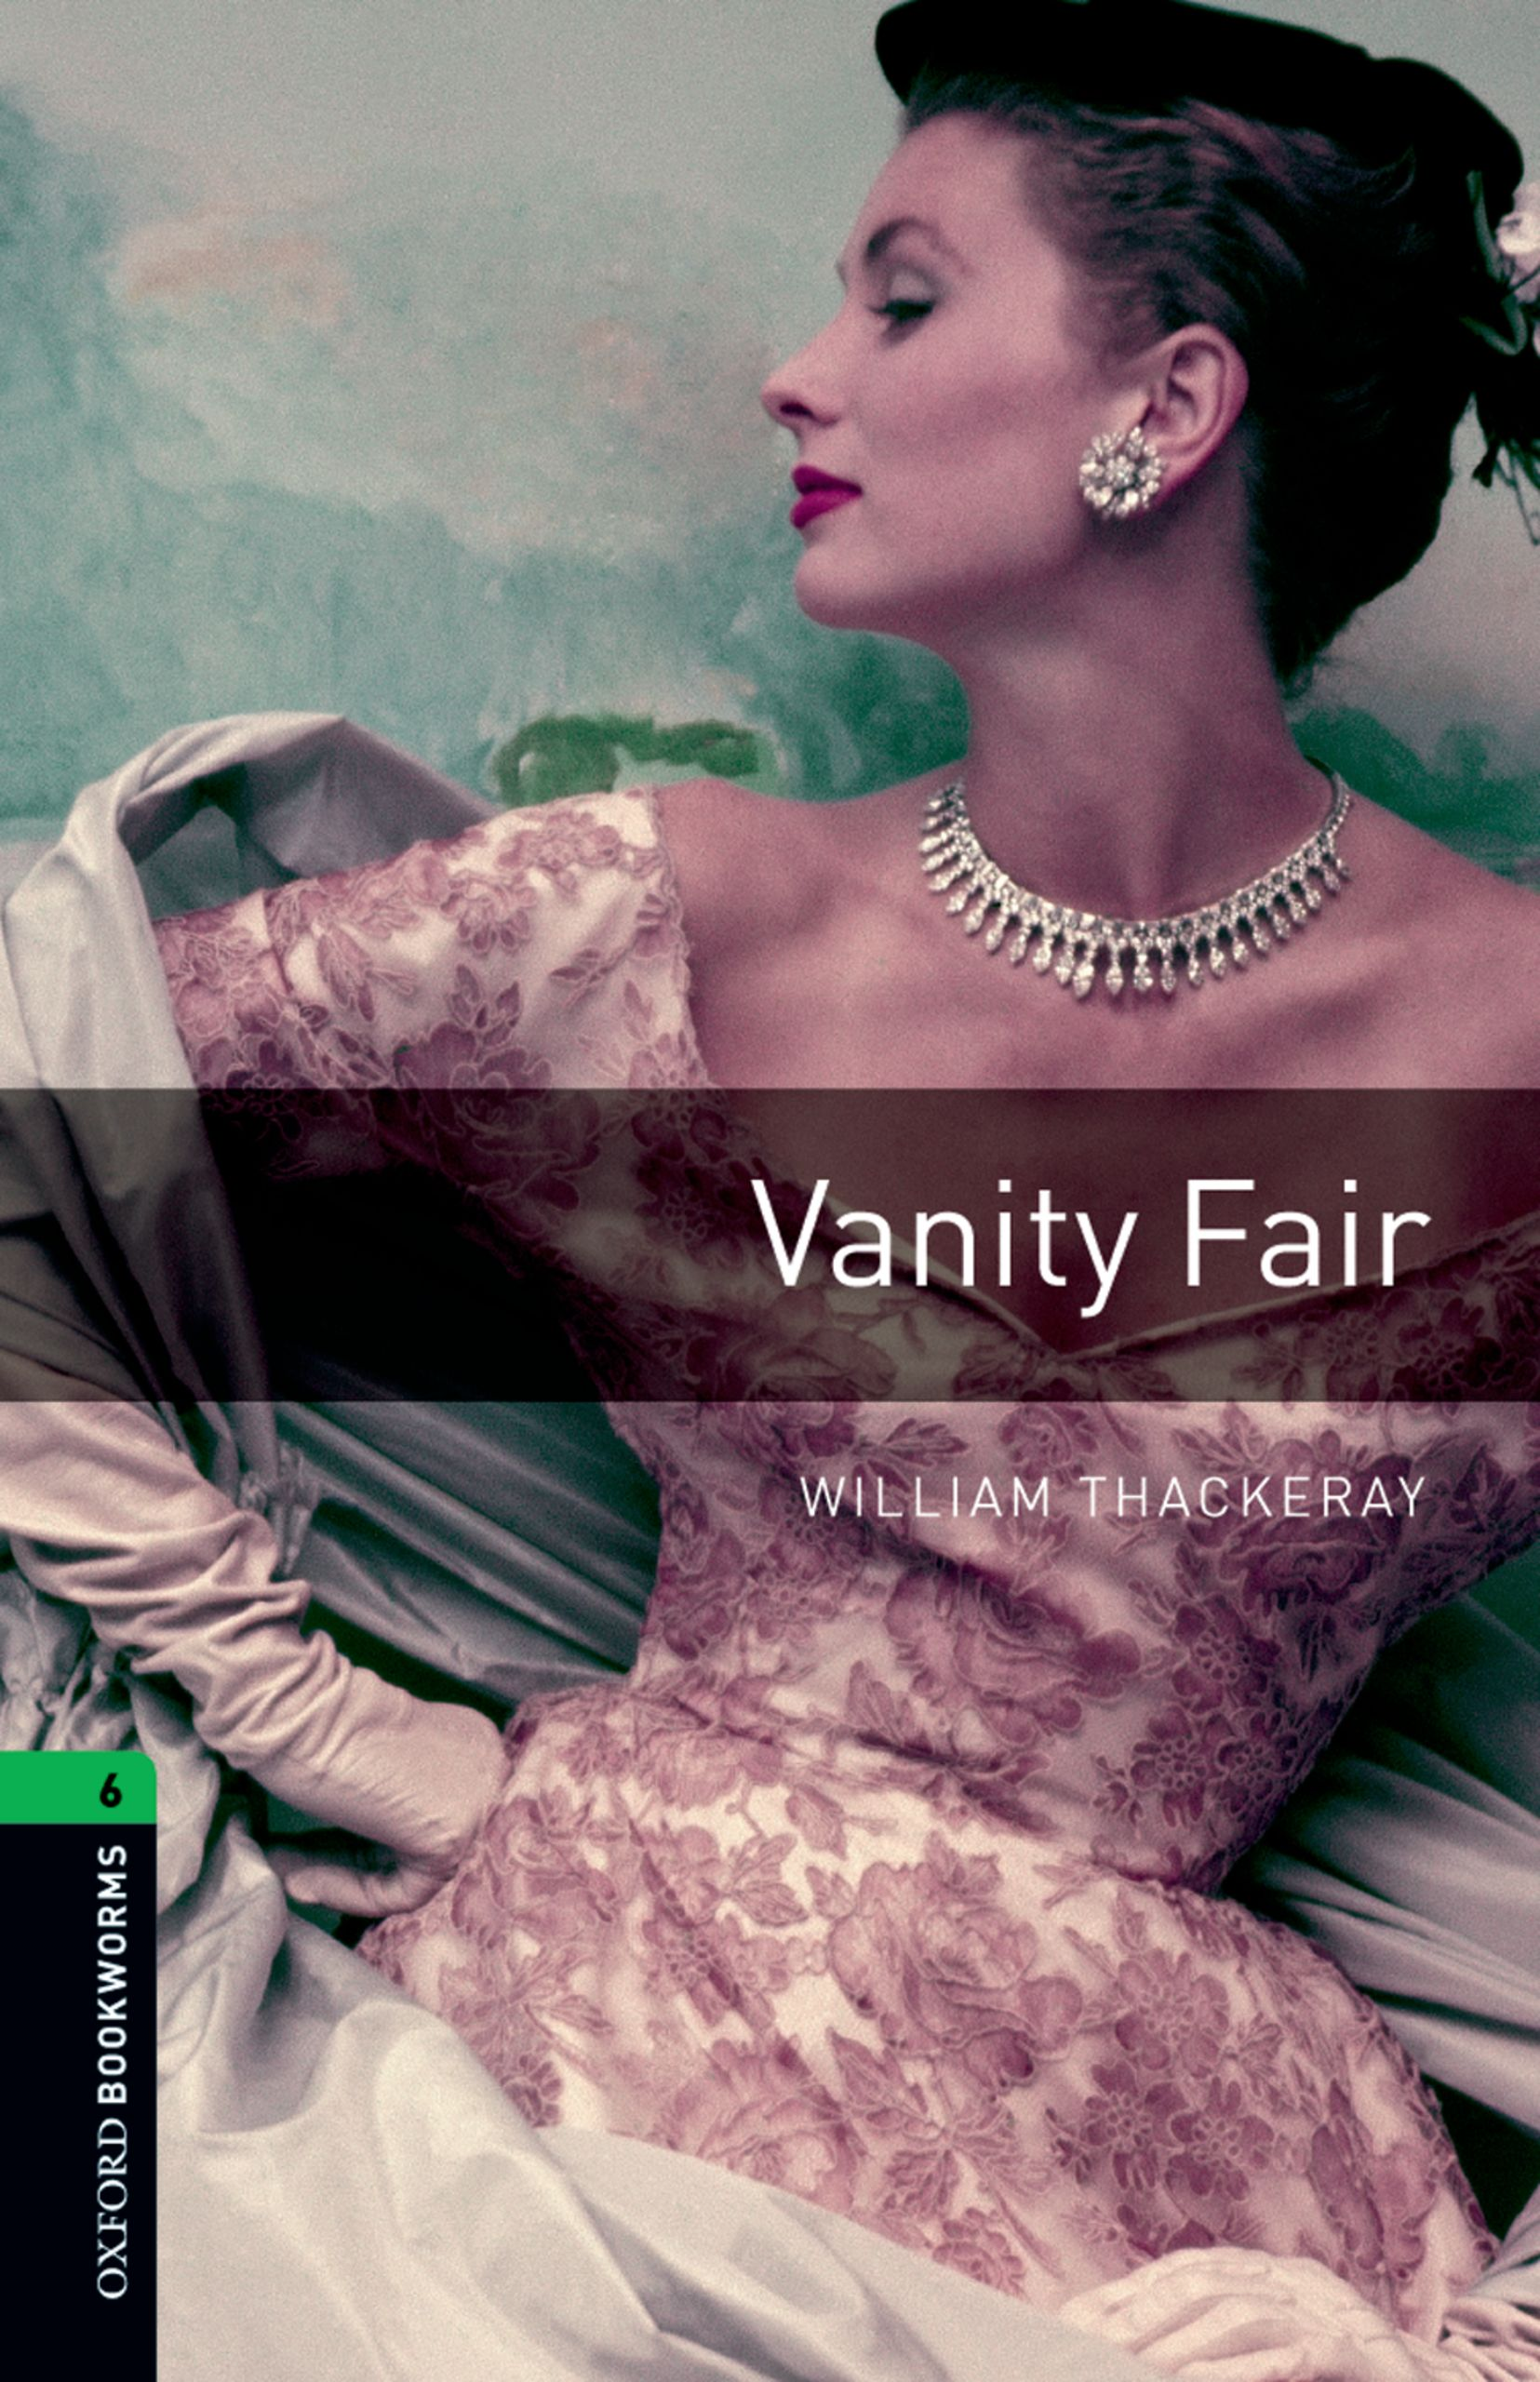 Уильям Мейкпис Теккерей Vanity Fair qiaojiahuayuan modern living room sofa background english hangs a picture 3pcs